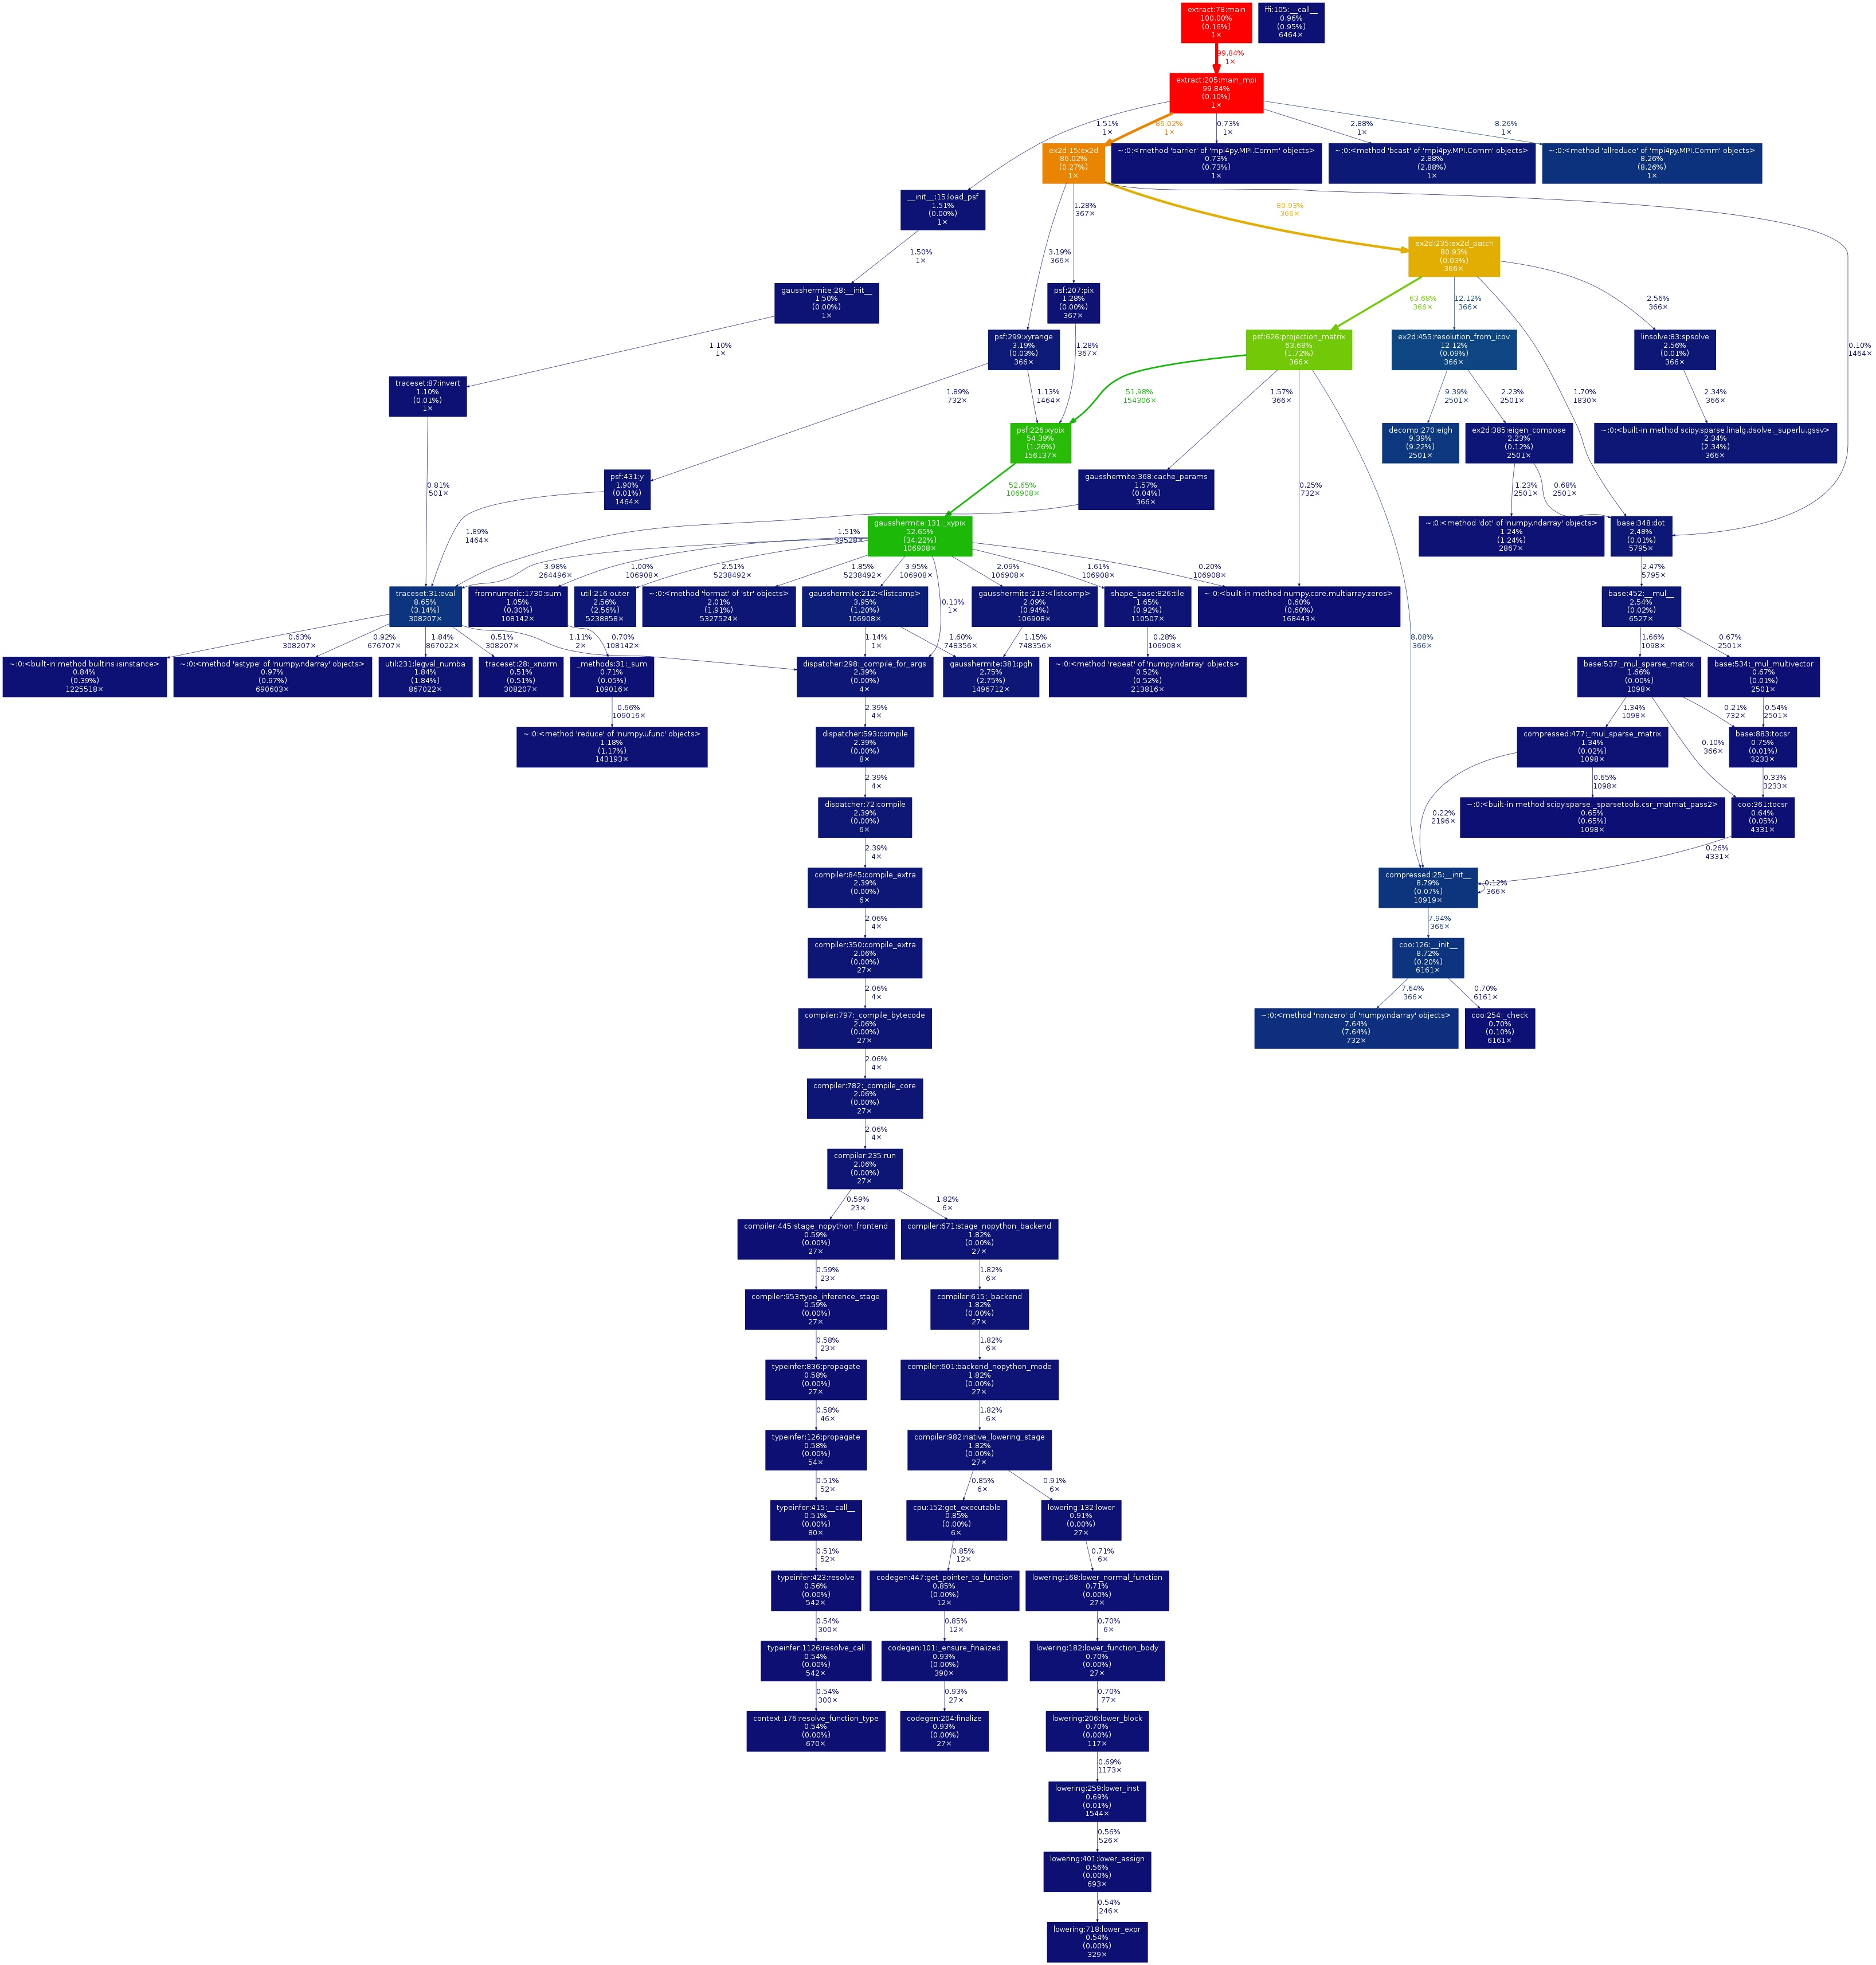 docs/development/high-level-environments/python/gprof2dot_ex.jpg